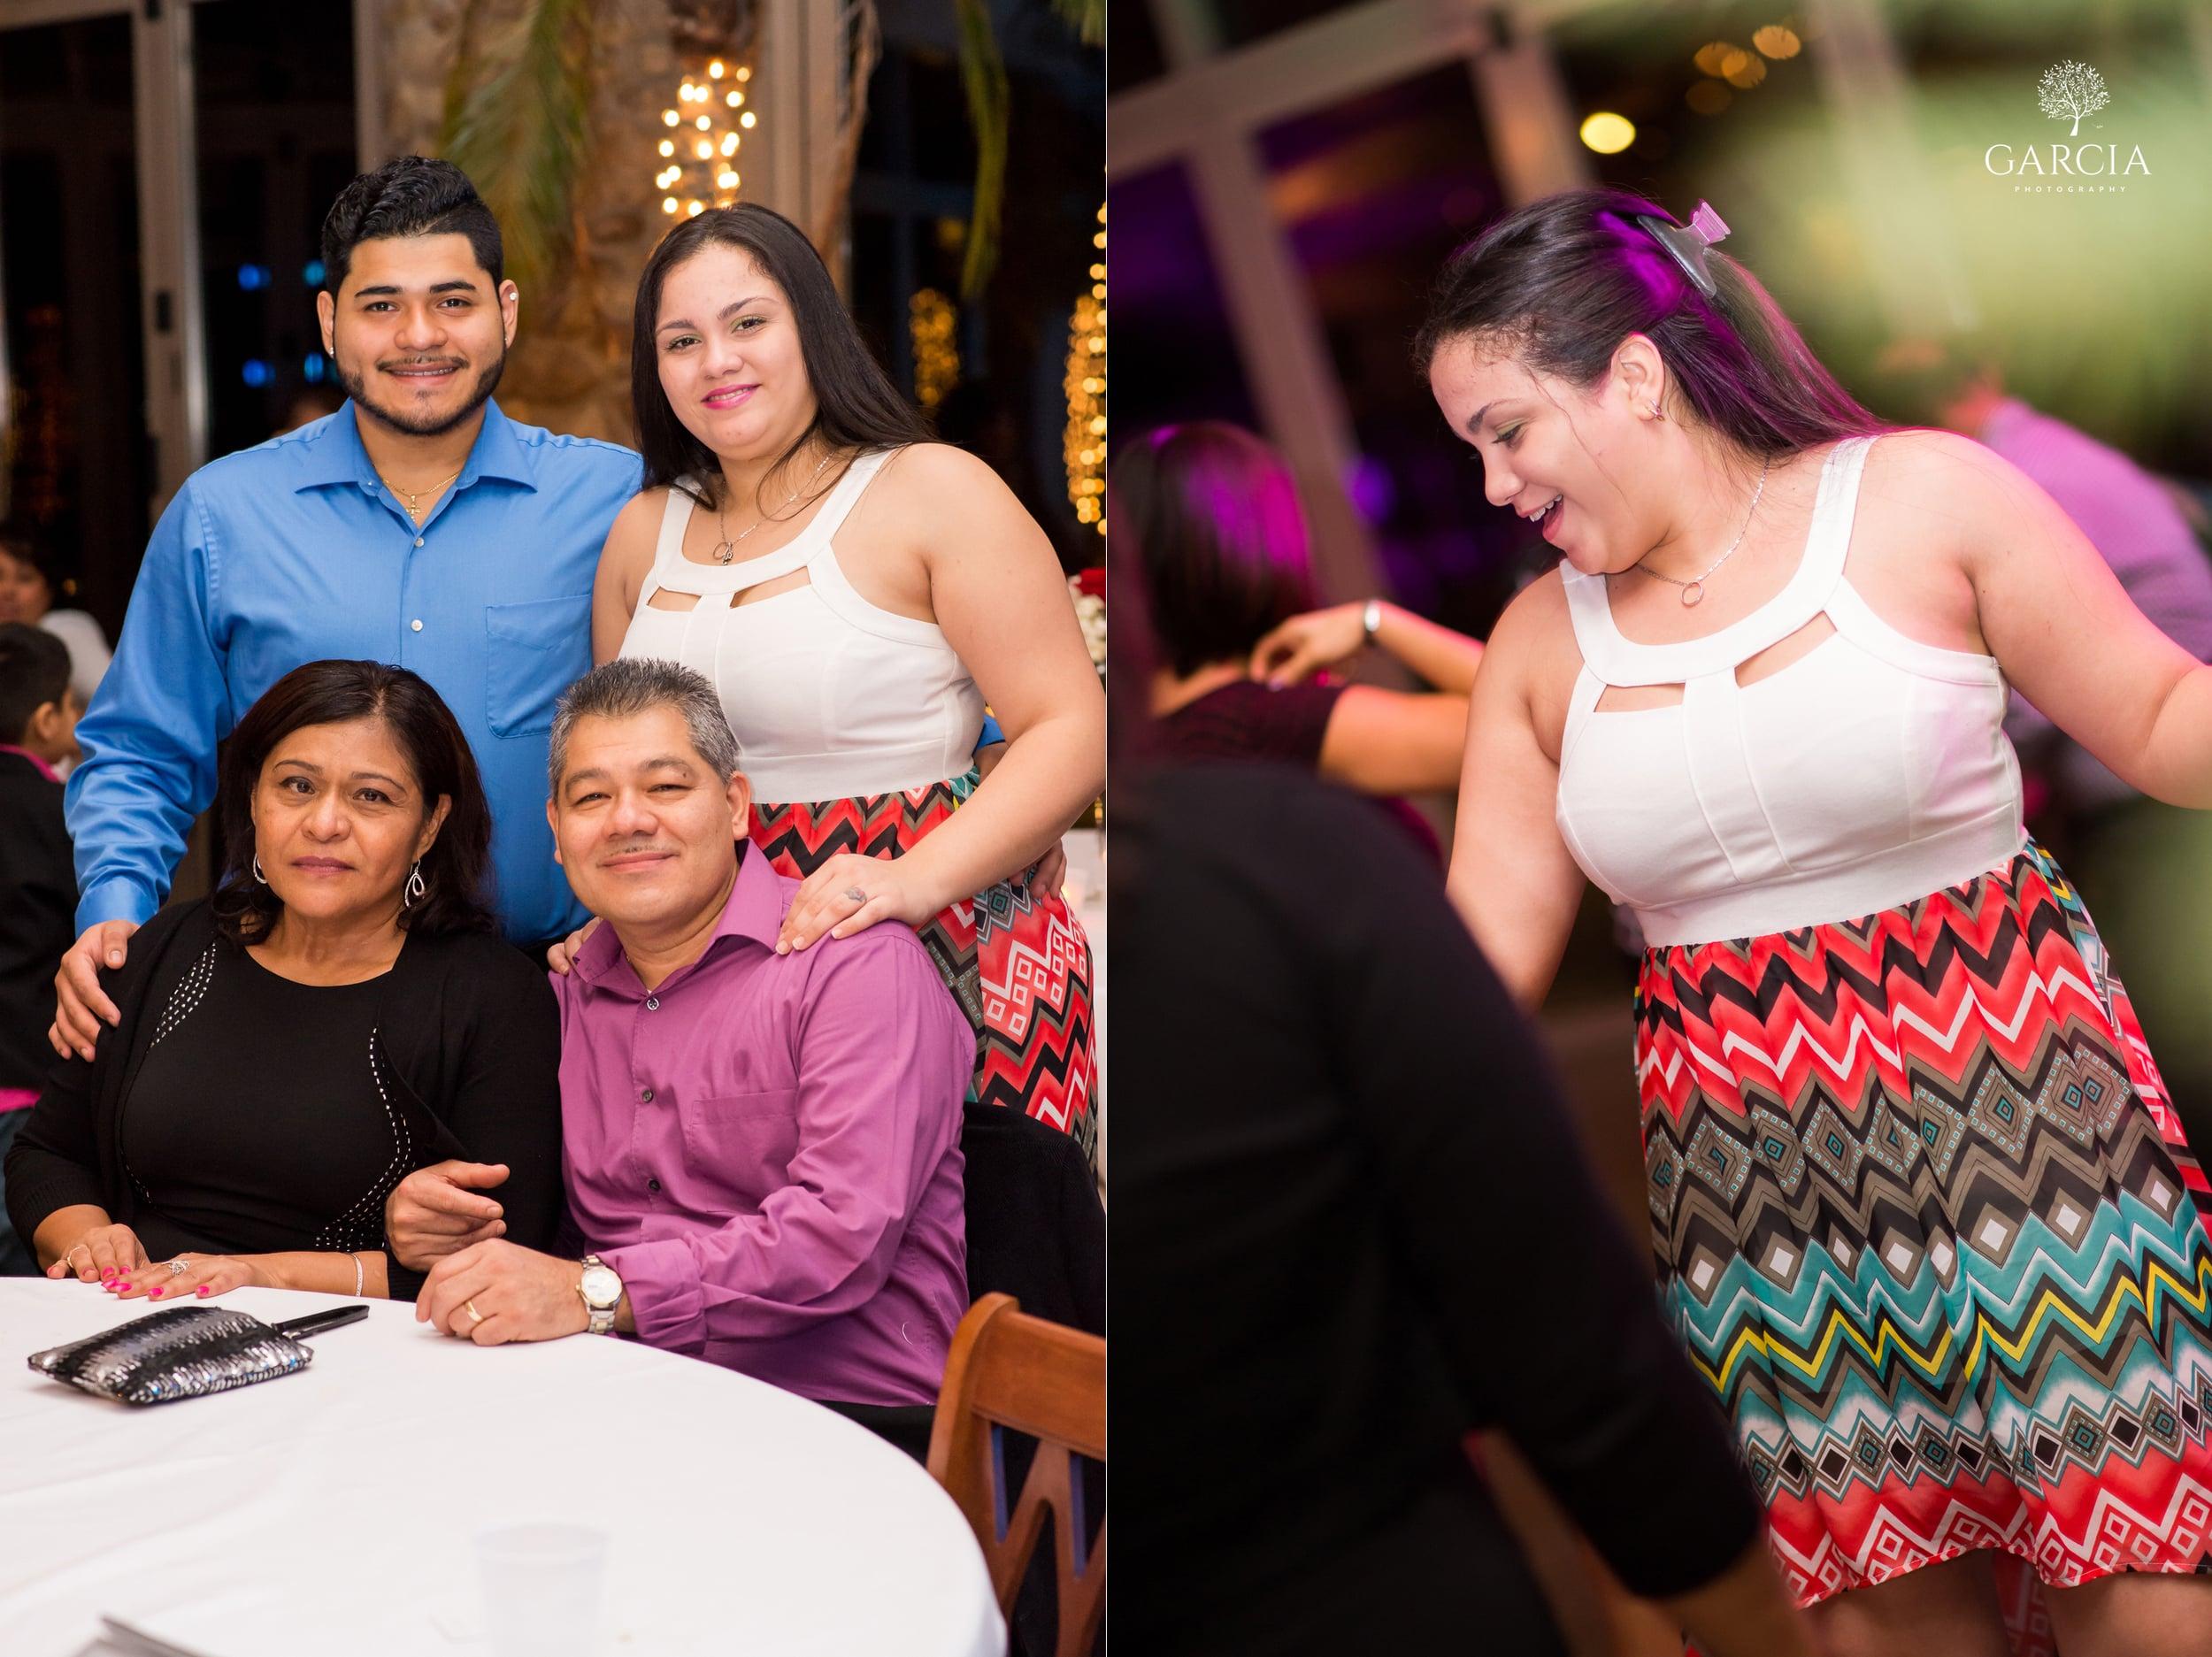 Neli-Birthday-Garcia-Event-Photography_2360.jpg